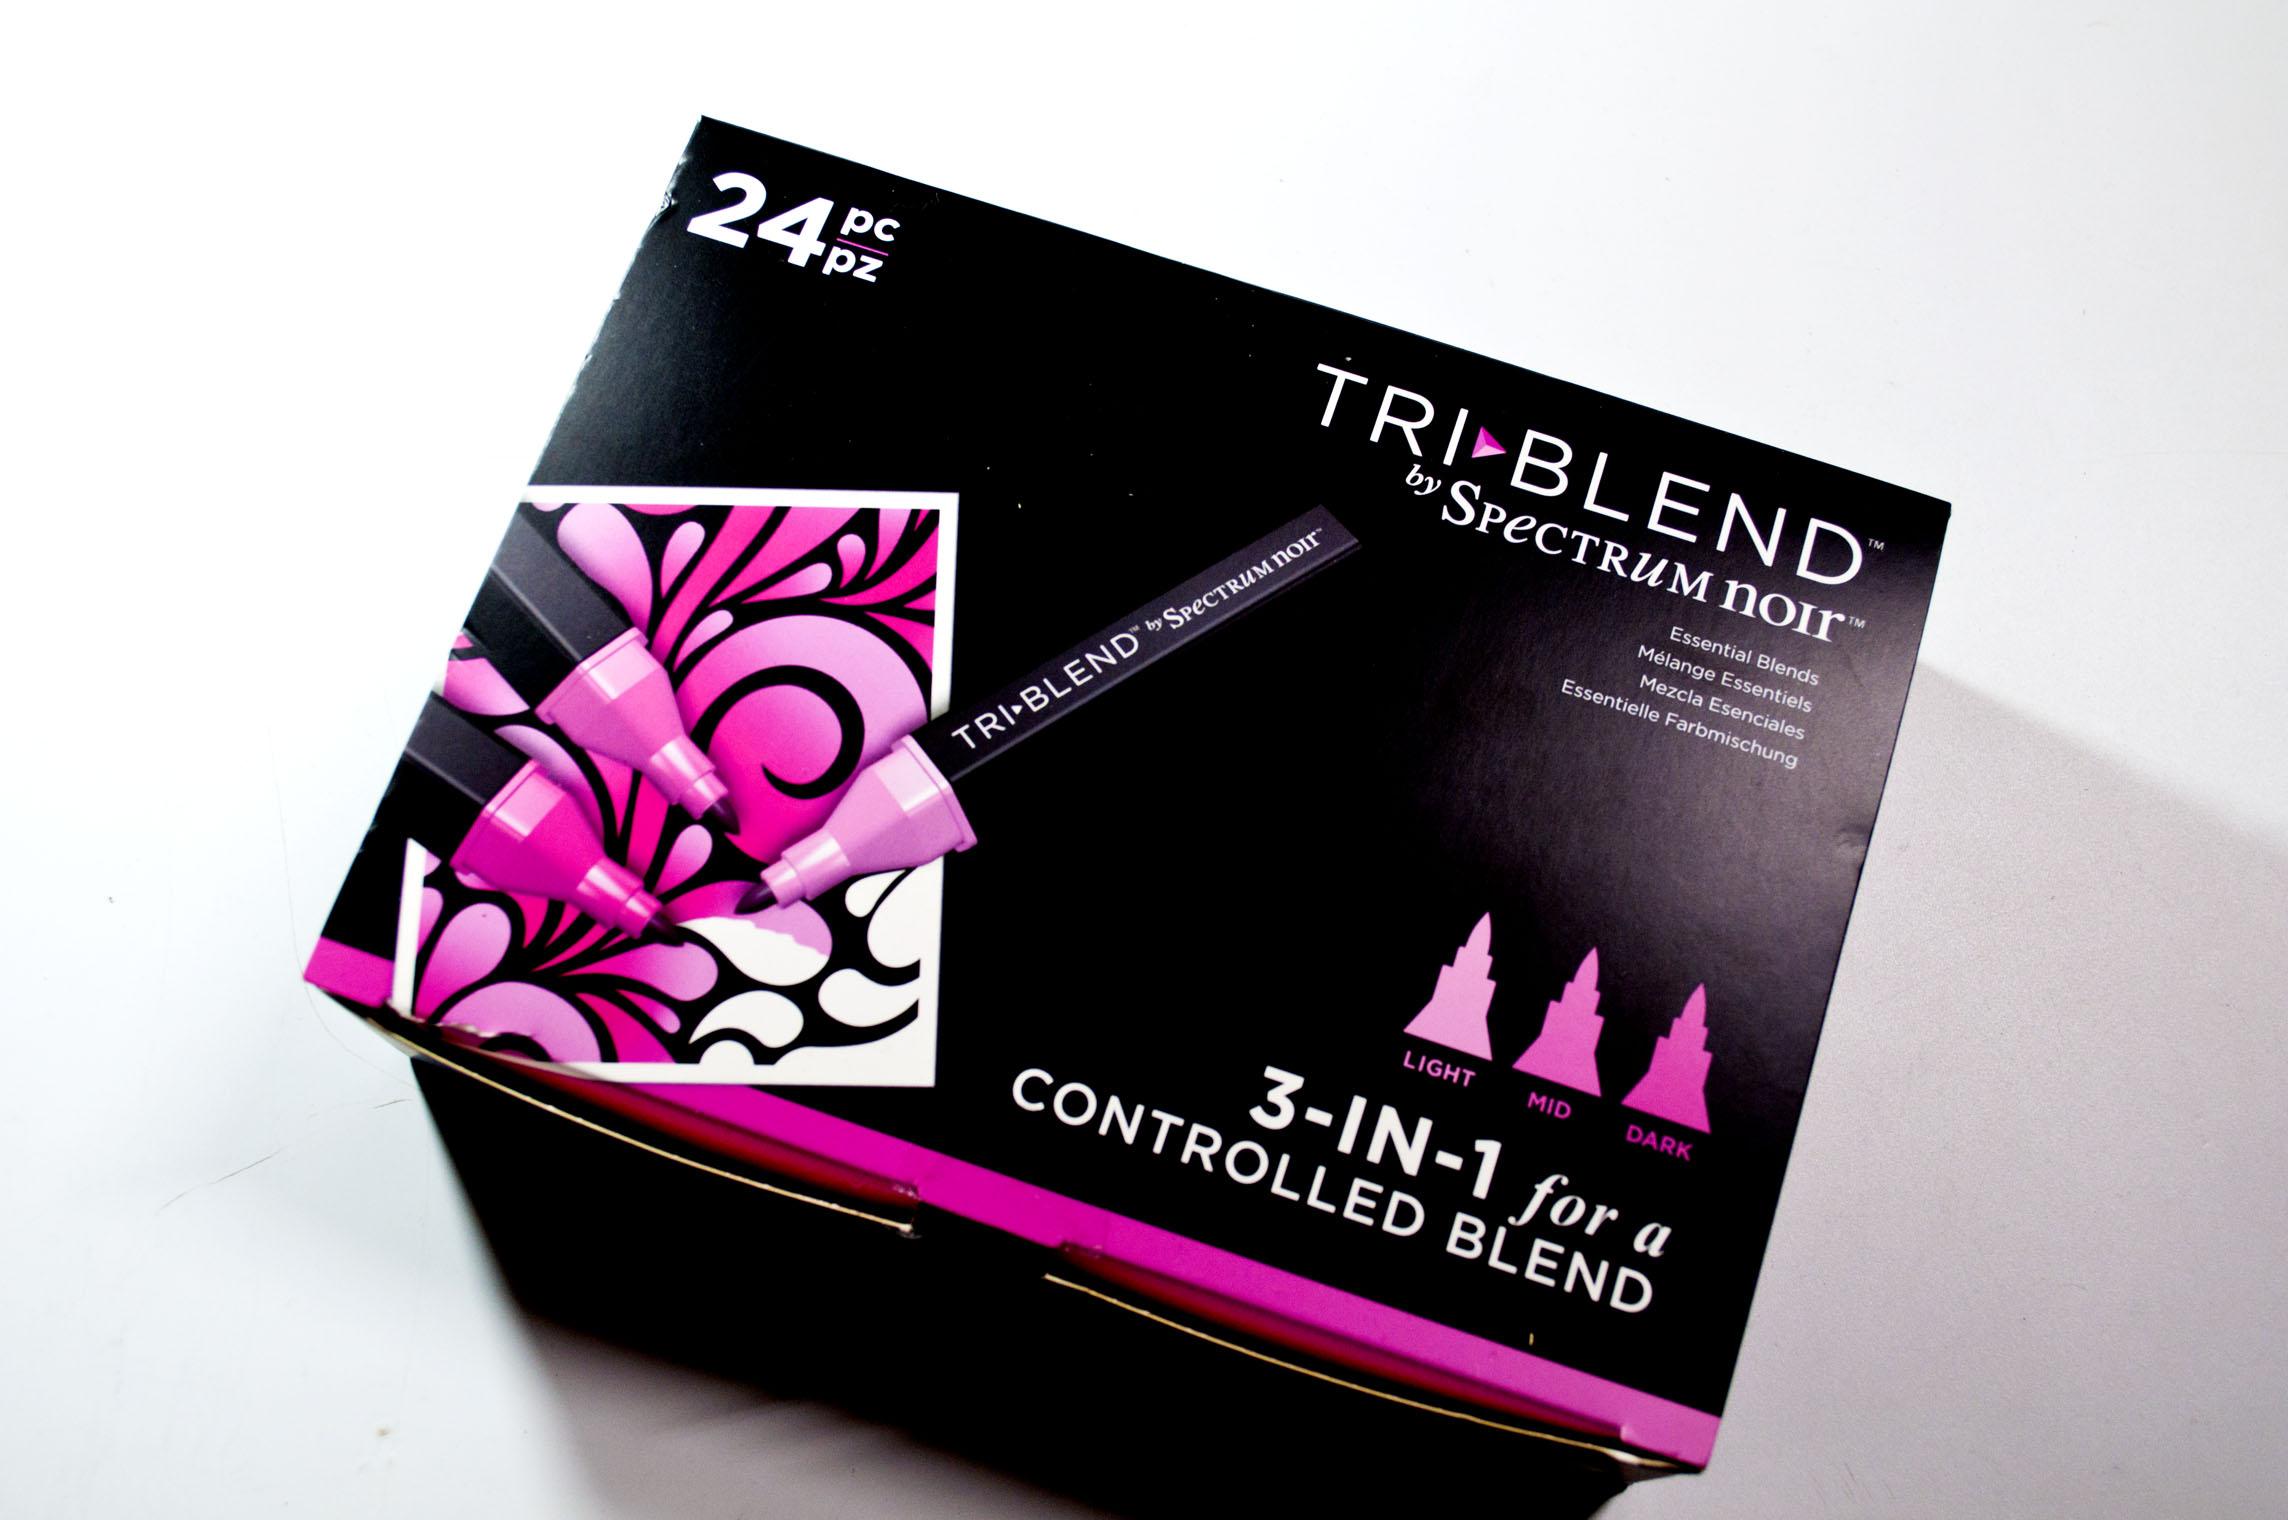 Spectrum Noir Tri-Blend Box.jpg